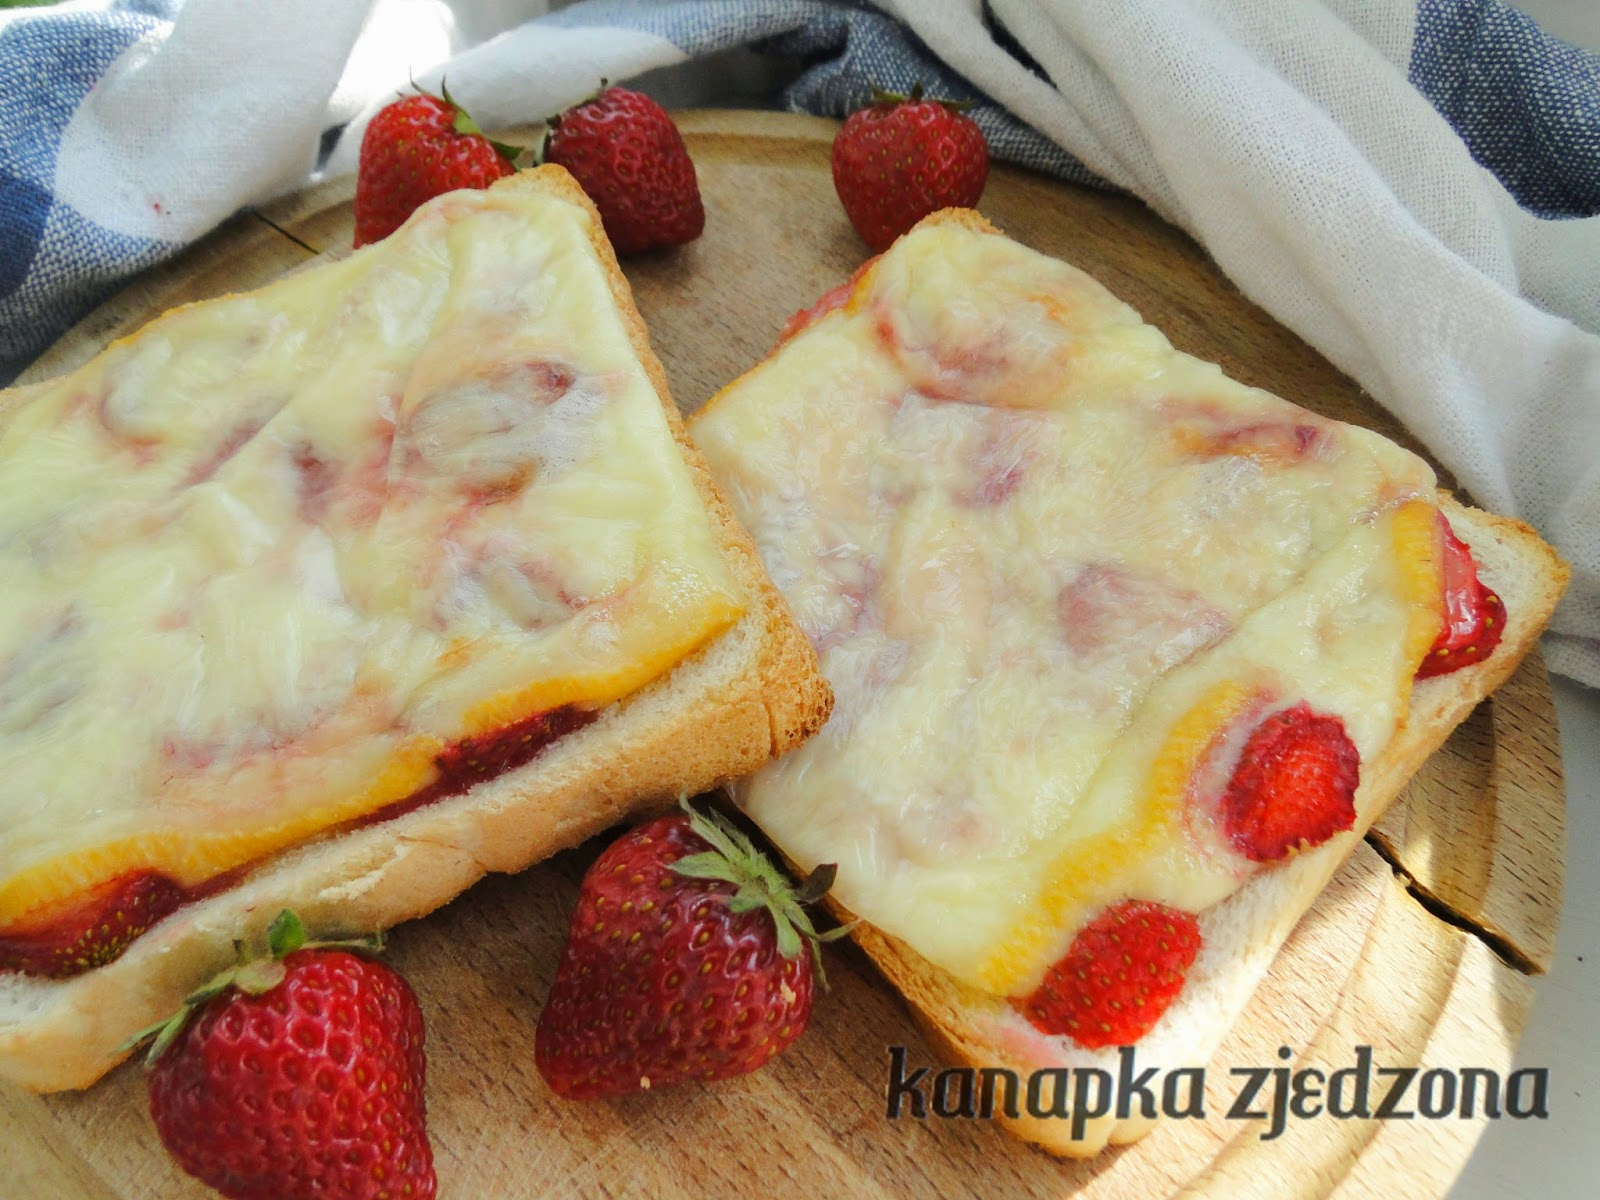 raclette con fresas, raclette with strawberries, Raclette mit Erdbeeren, raclette avec des fraises, na ciepło, na słodko, truskawki, raclette